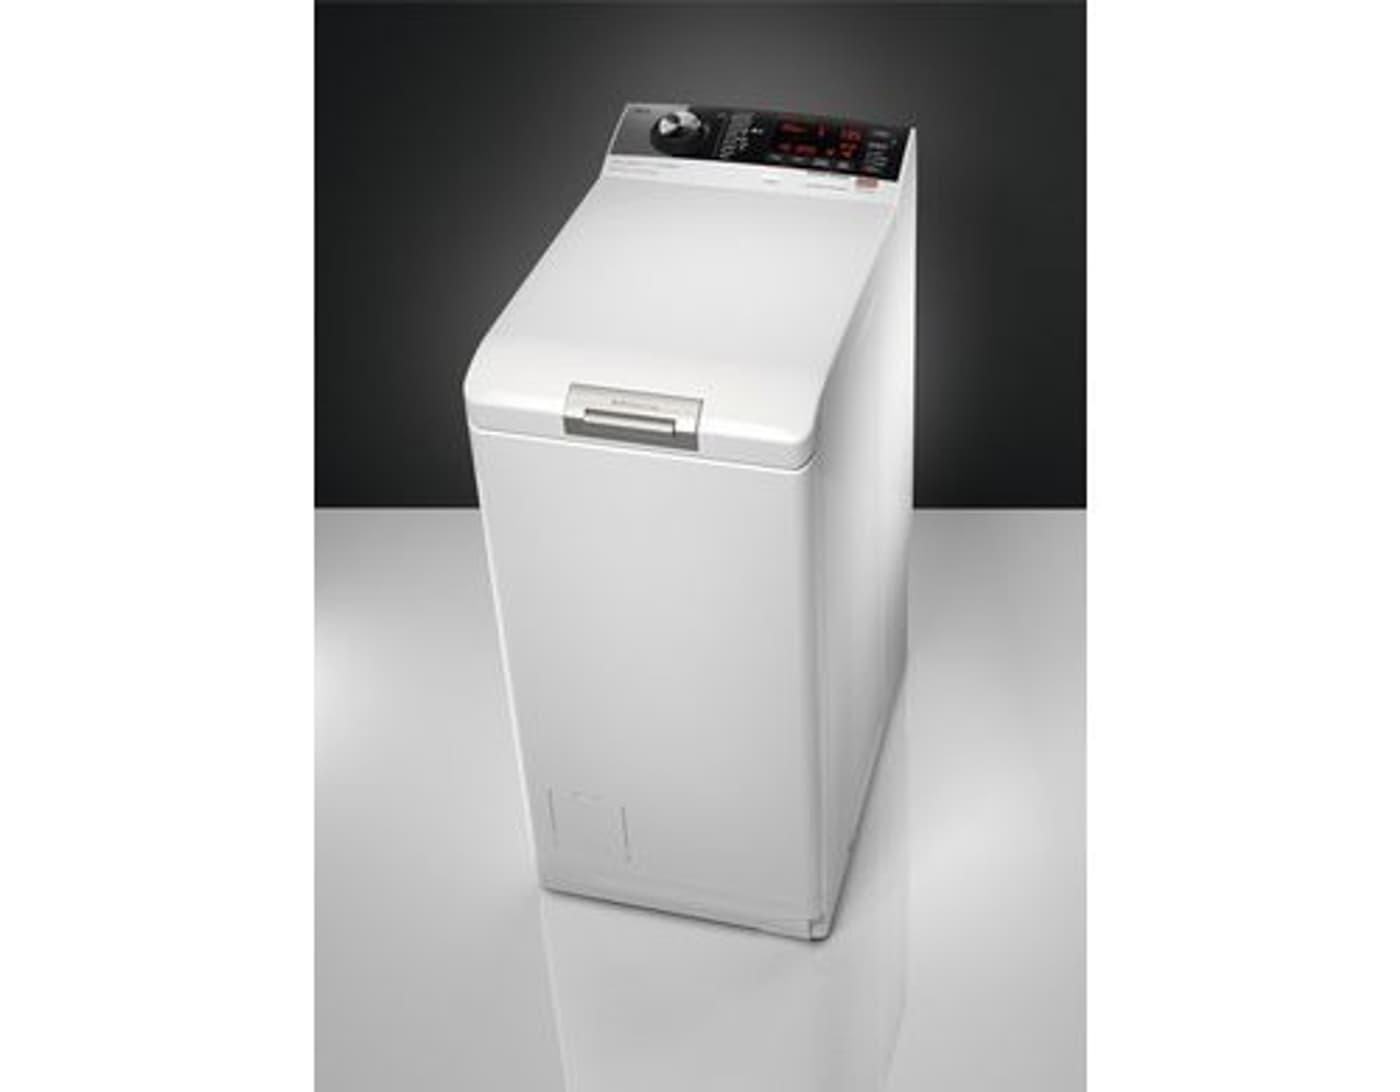 Electrolux wagl5t300 waschmaschine migros